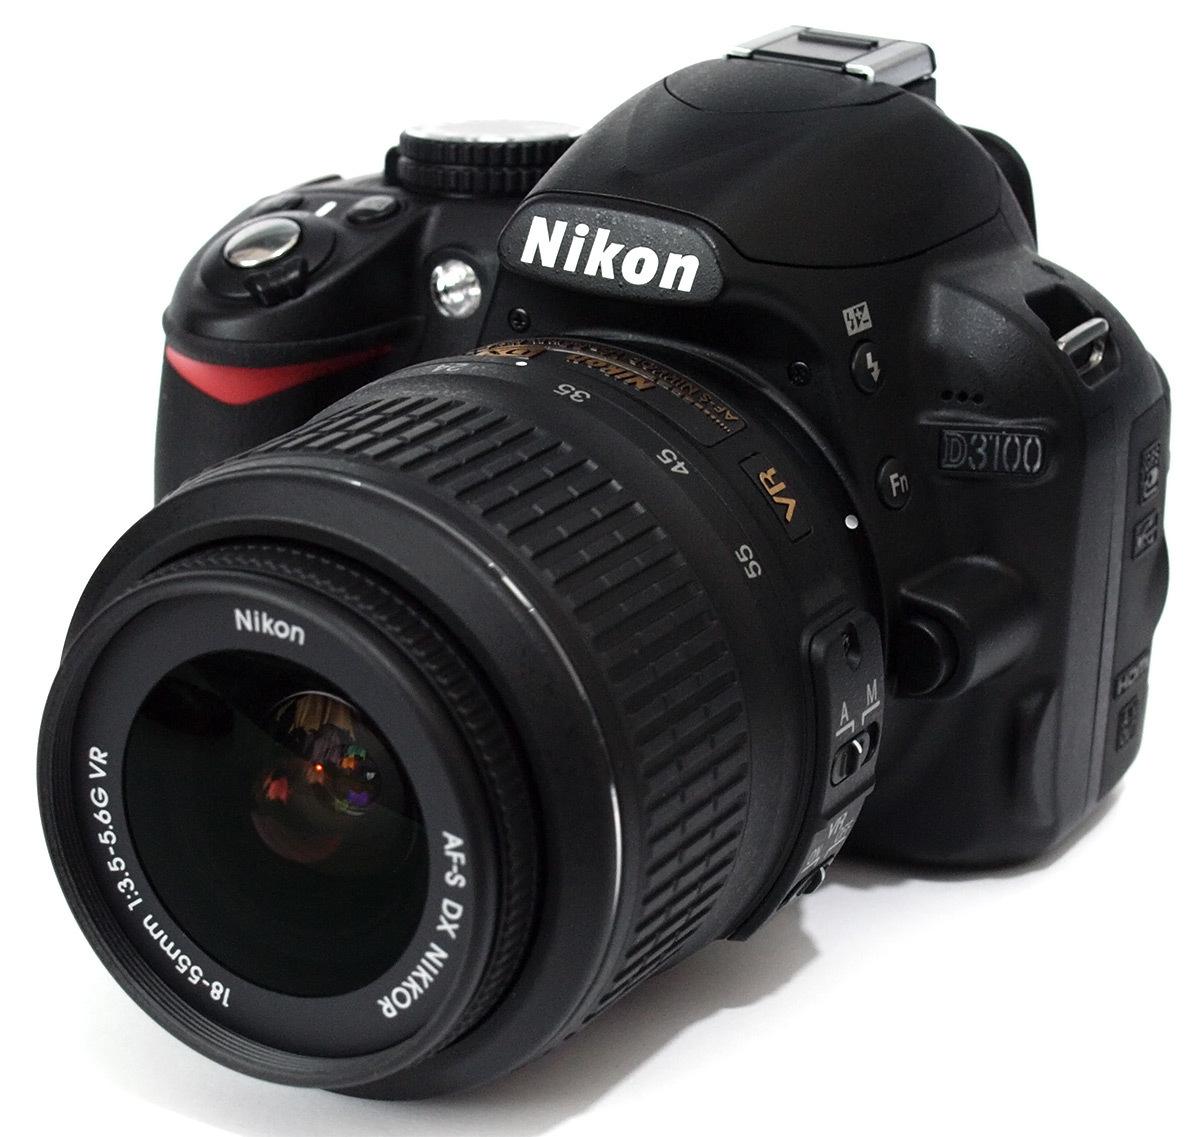 Nikon D3100 18-55mm Kit + Nikon Free Gifts